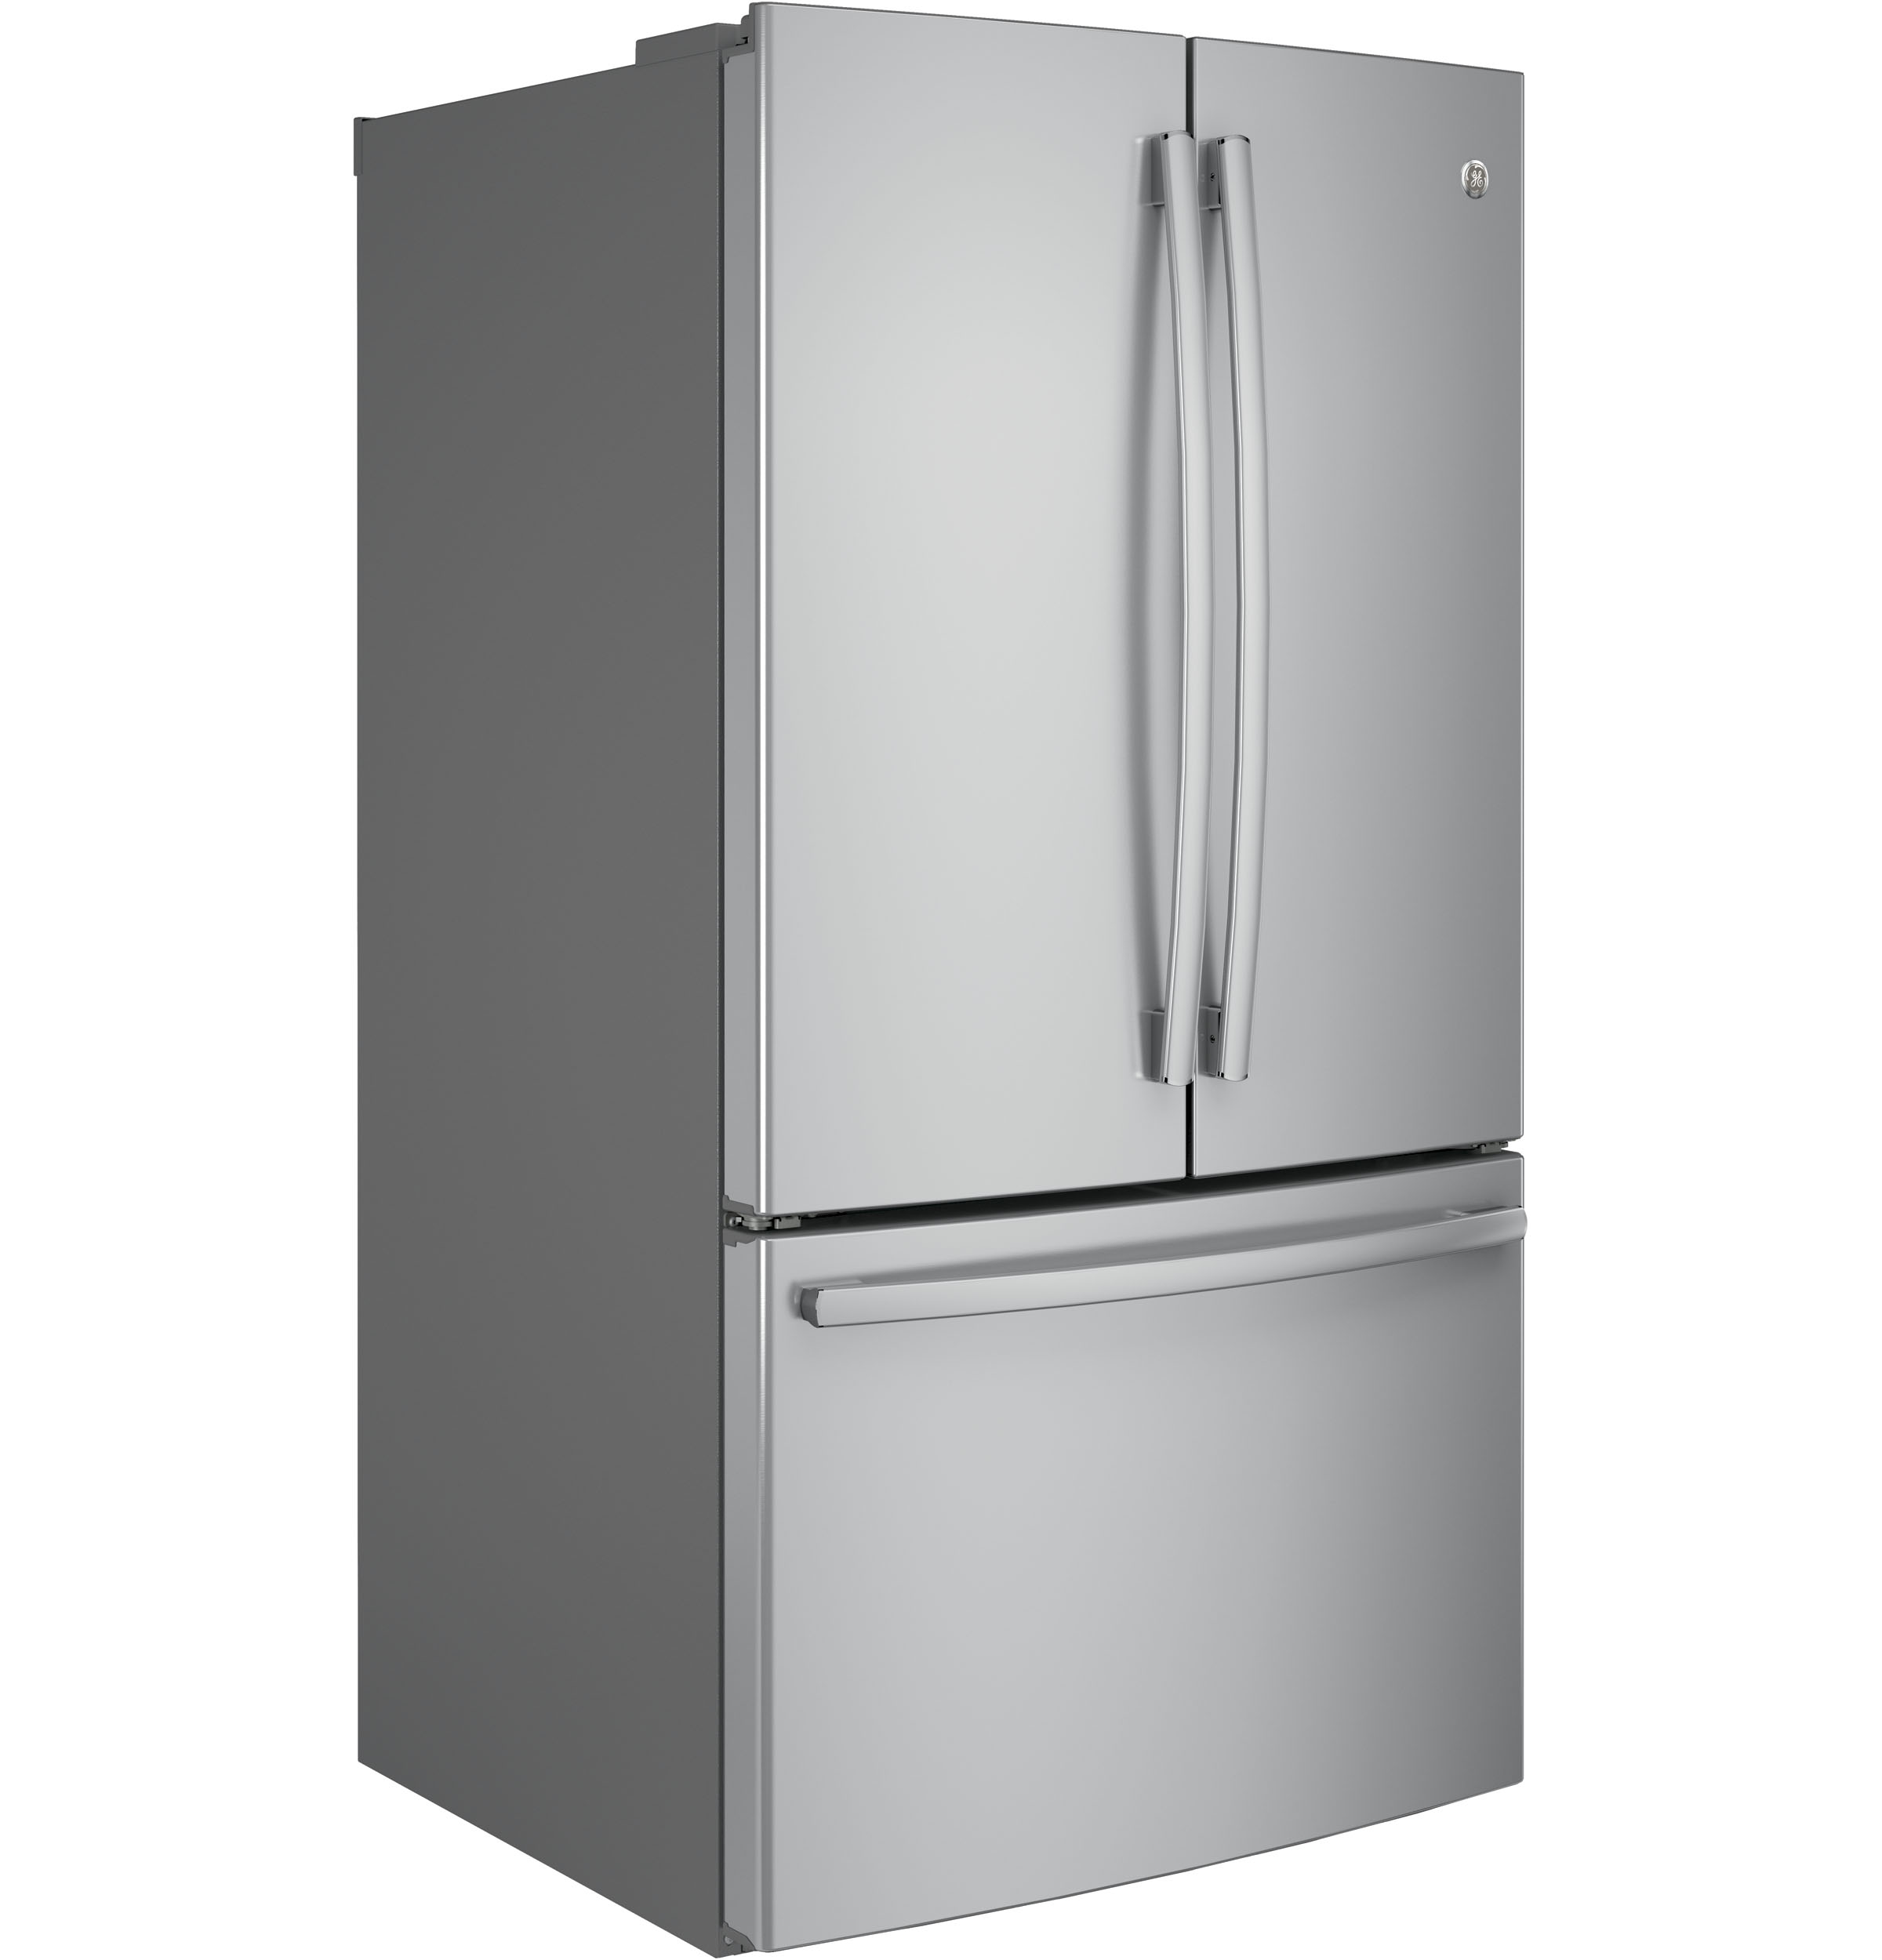 Model: GNE29GSKSS | GE® ENERGY STAR® 28.7 Cu. Ft. French-Door Refrigerator